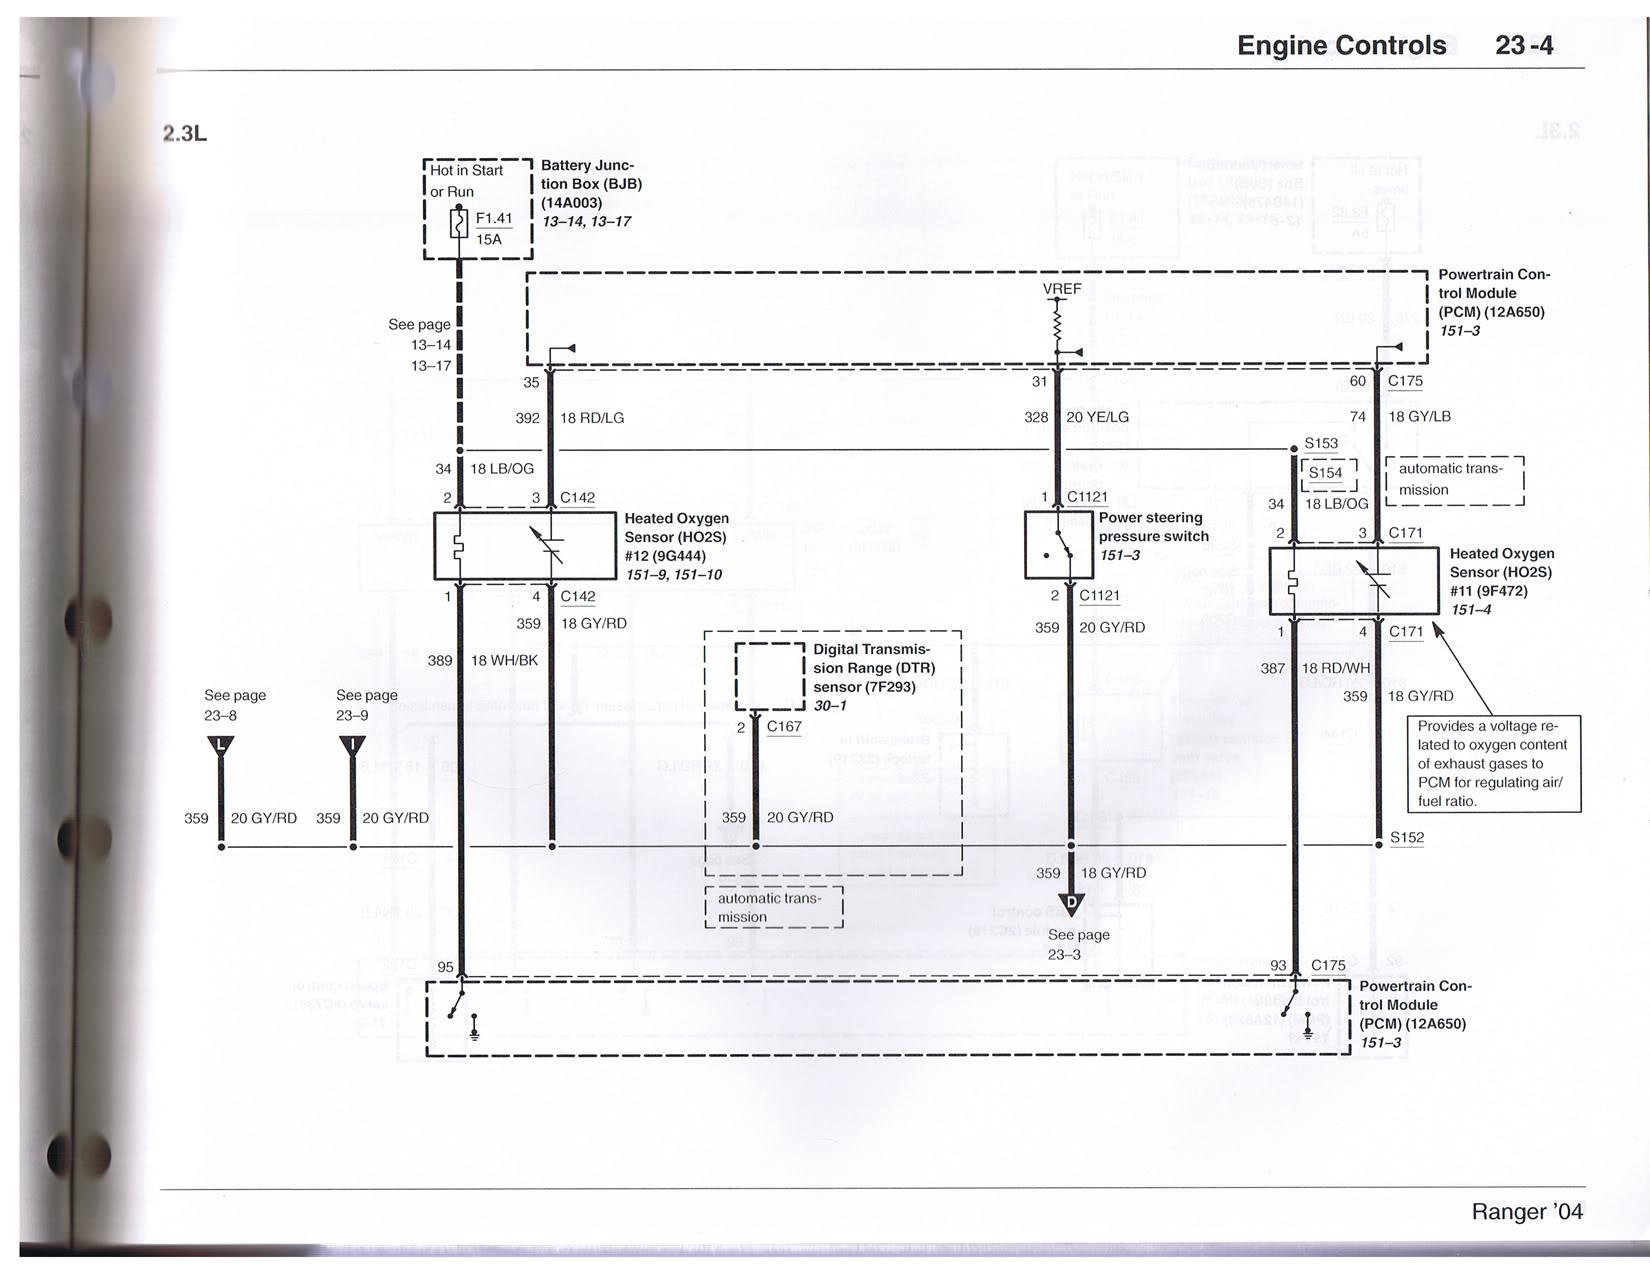 183476d1501435560 2004 2006 2 3 wiring diagram huge pics cci00007?resize\=665%2C514\&ssl\=1 2006 ford explorer wiring diagram 2004 chevrolet tahoe wiring 2004 chevrolet tahoe wiring diagram at soozxer.org